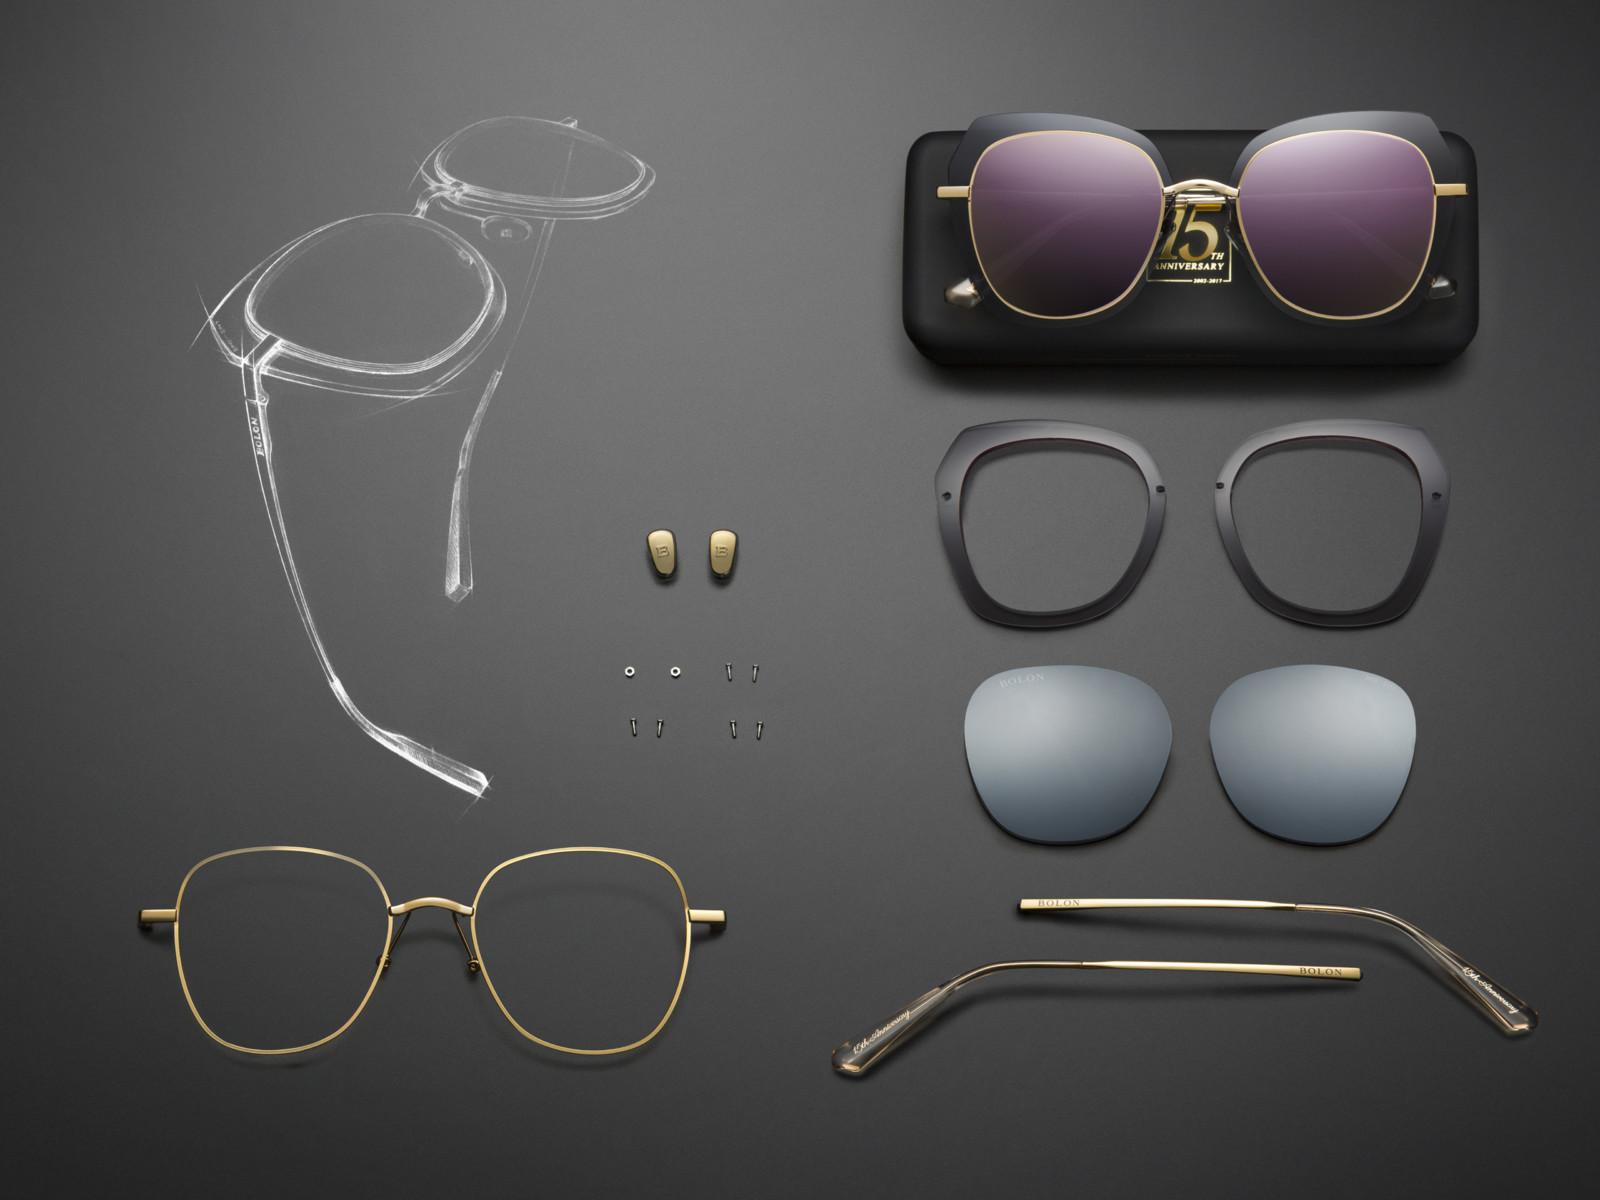 f59e5bafa01aea Essilor introduceert Bolon Eyewear • News - De Opticien